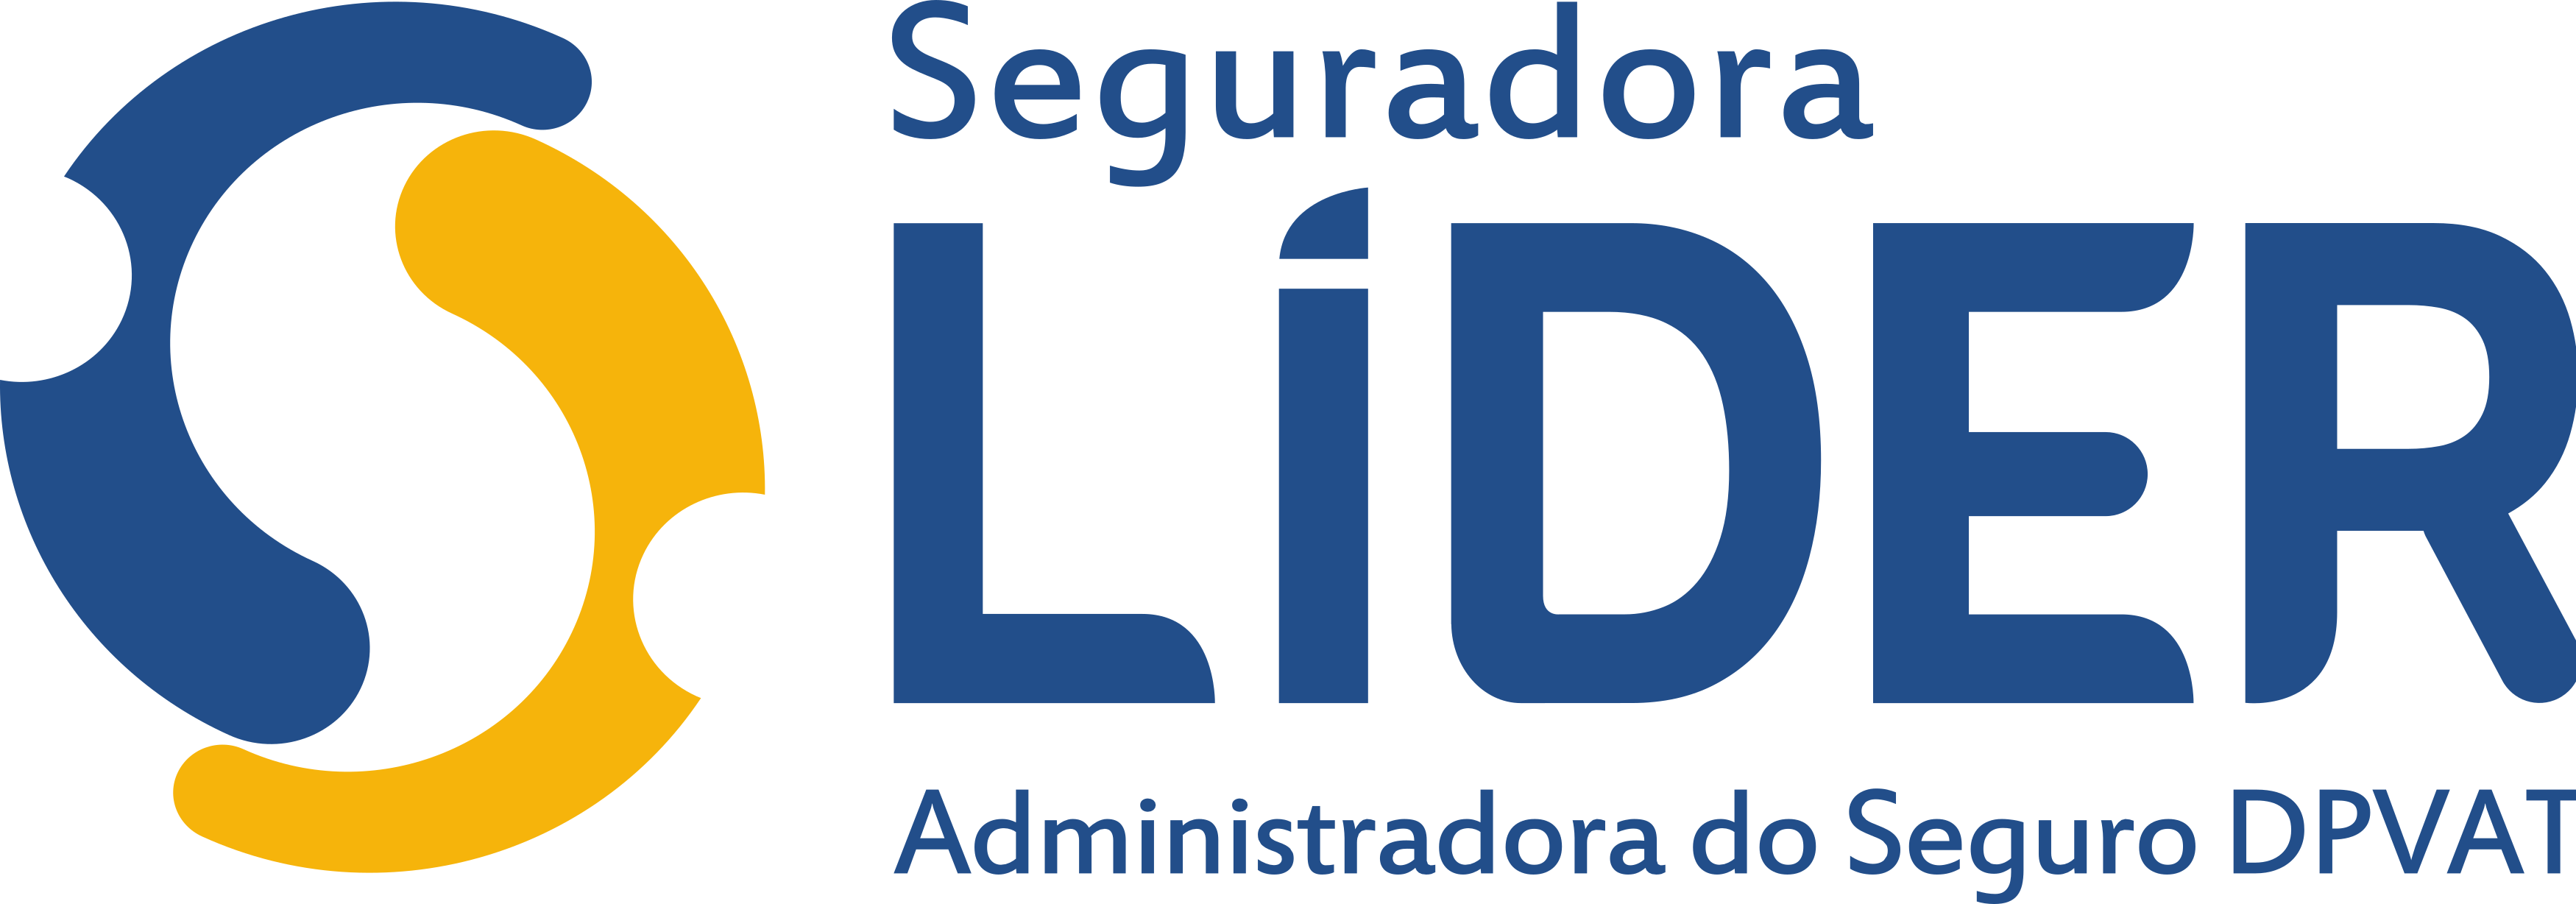 Seguradora Lider DPVAT Logo.